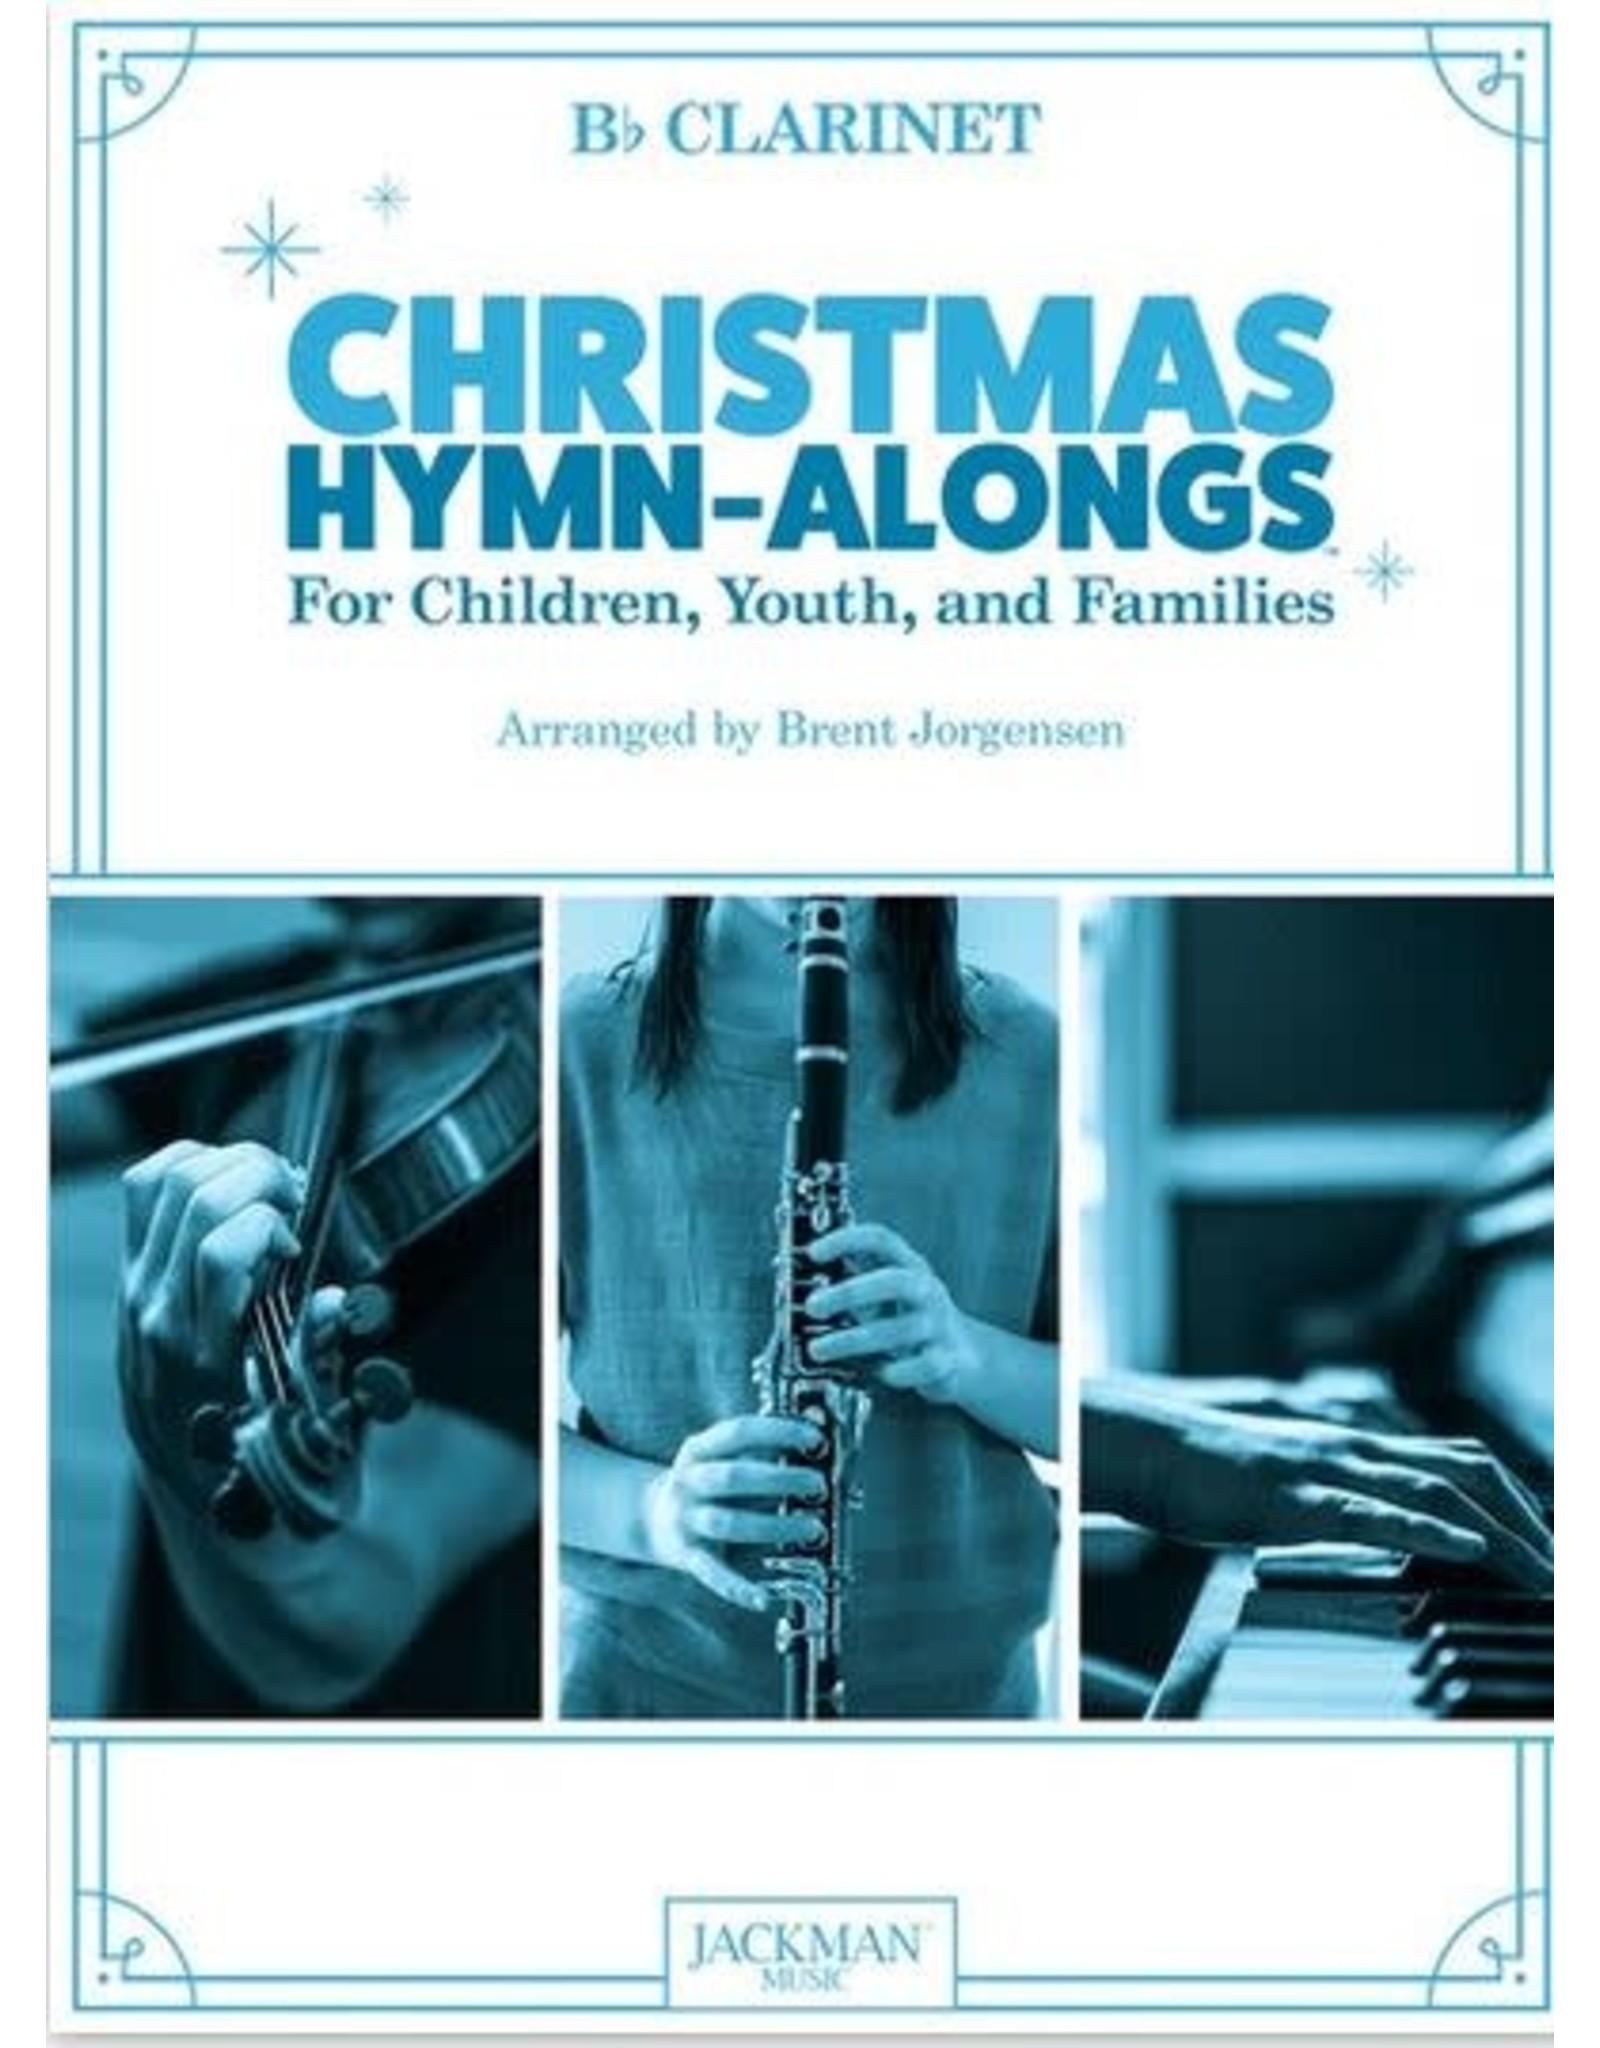 Jackman Music Christmas Hymn-Alongs - arr. Brent Jorgensen - Clarinet